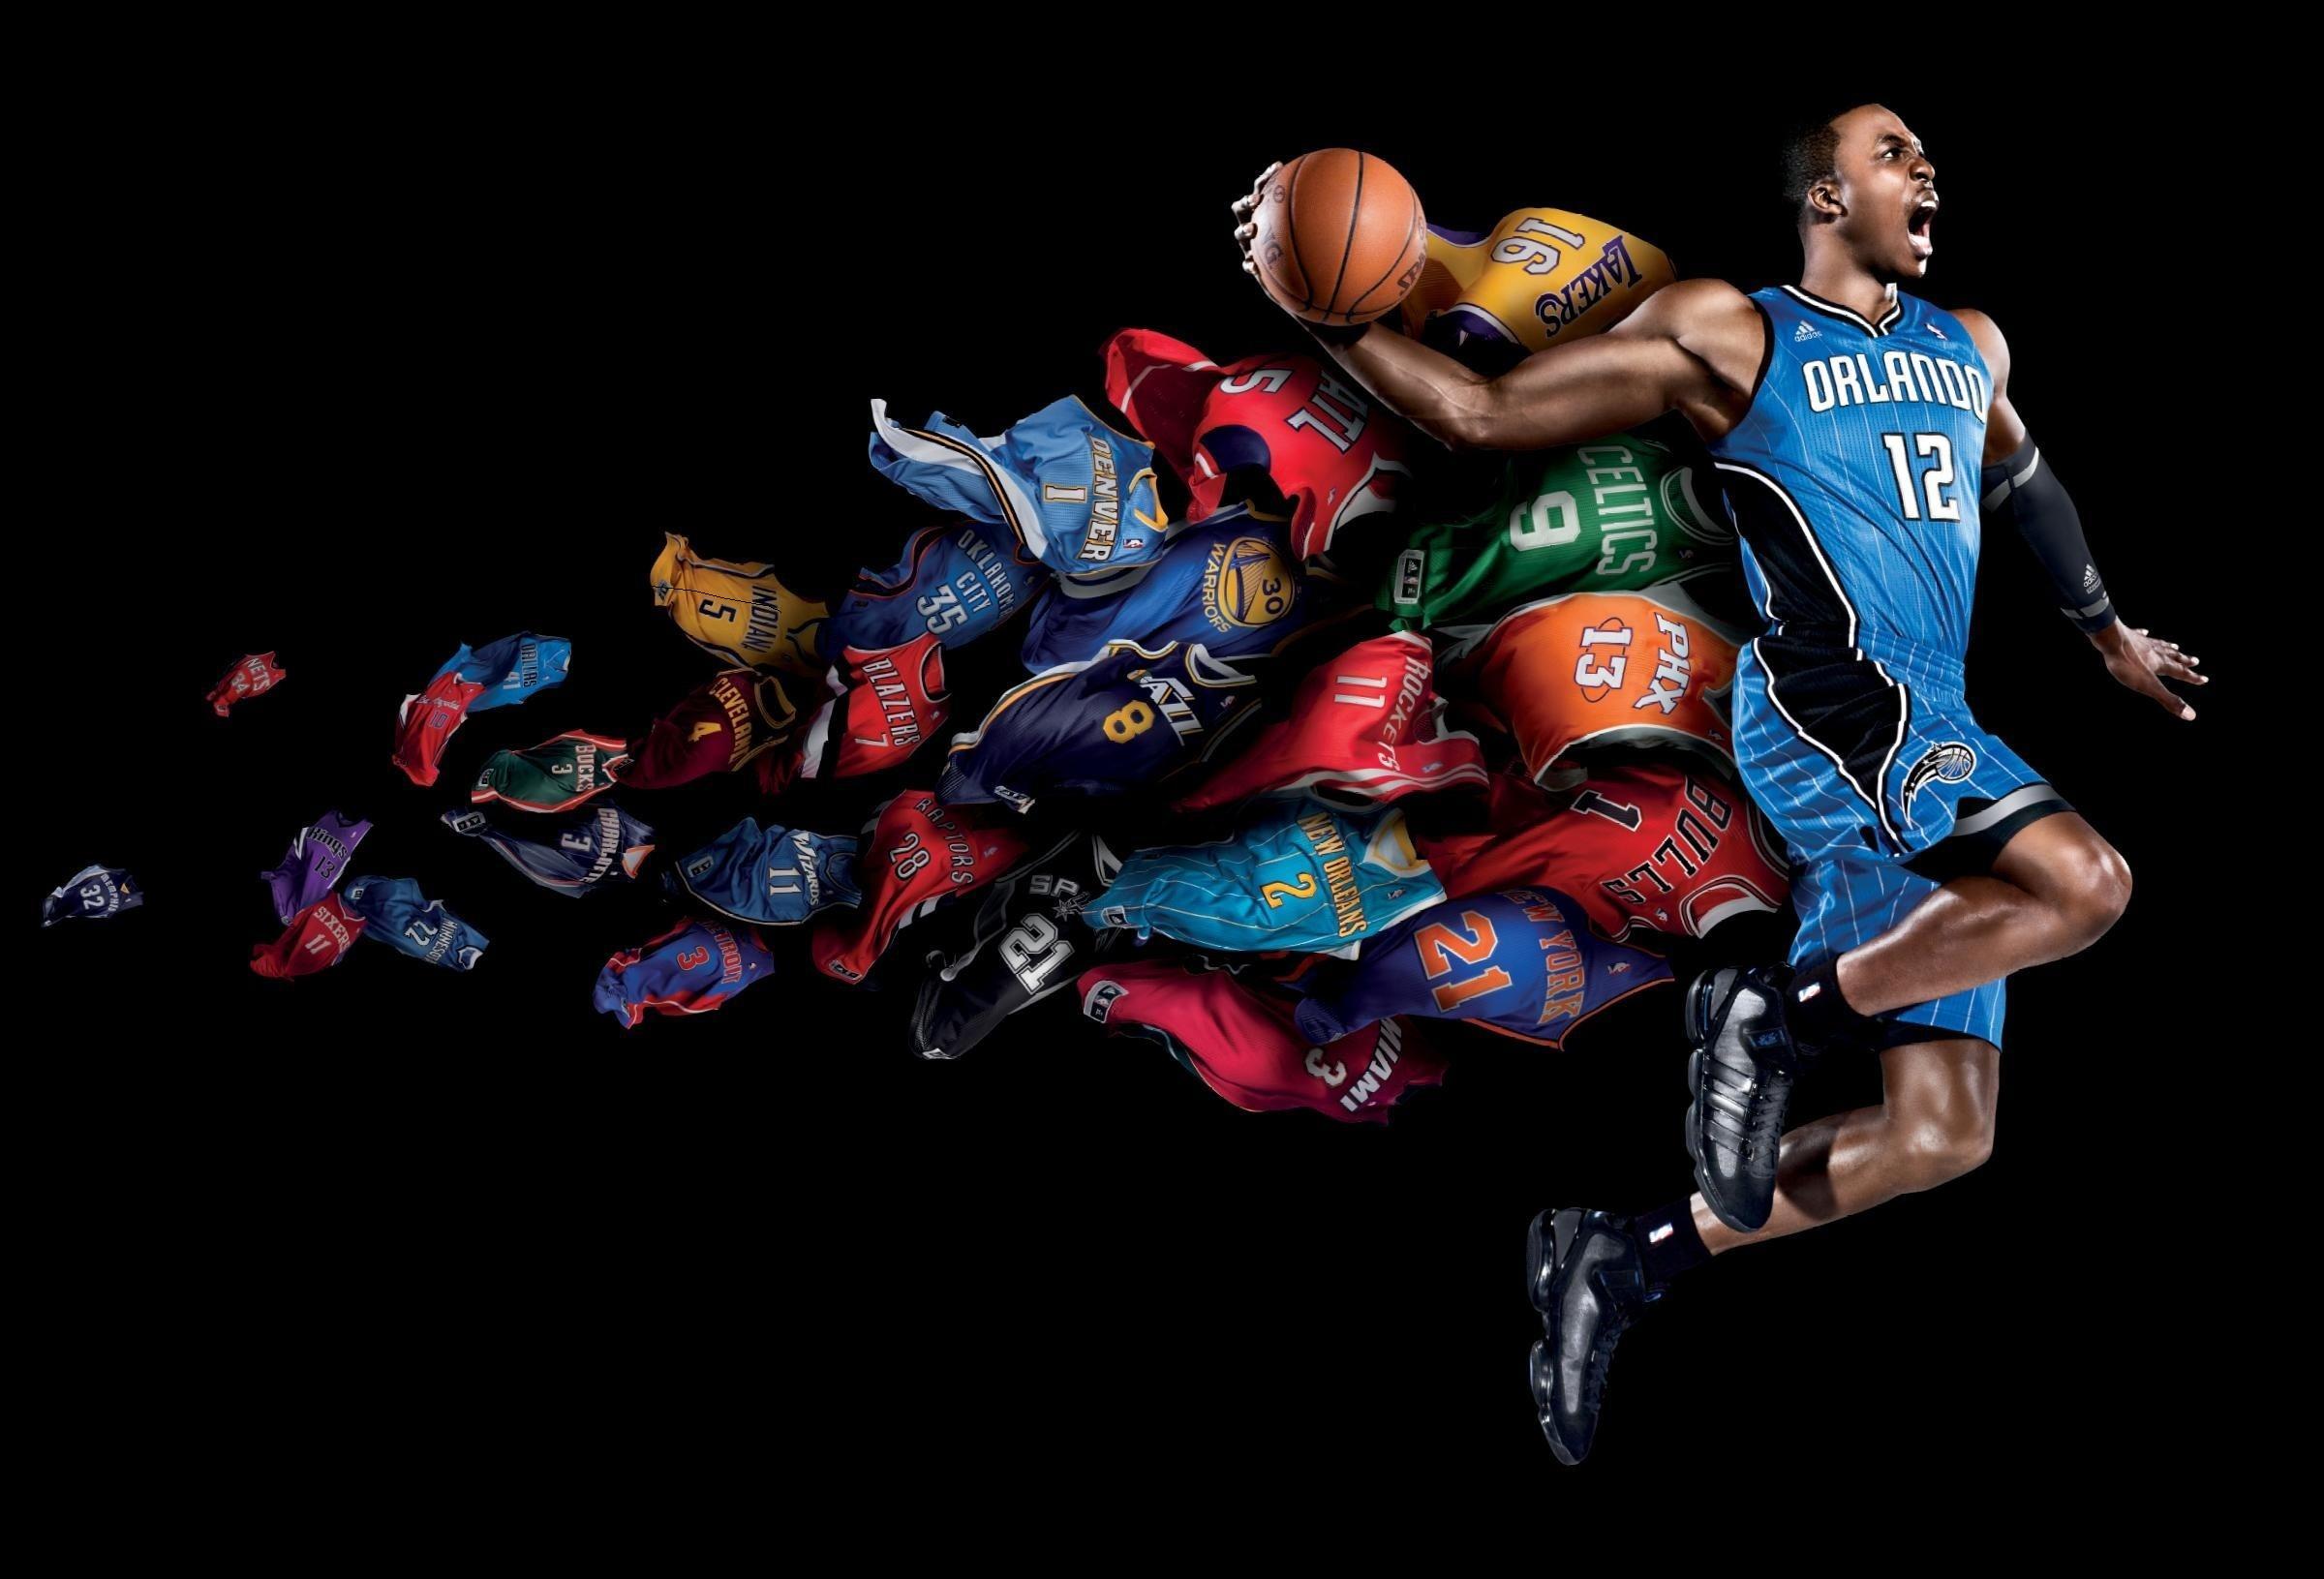 Basketball HD Wallpapers Basketball Desktop Images 2400x1631